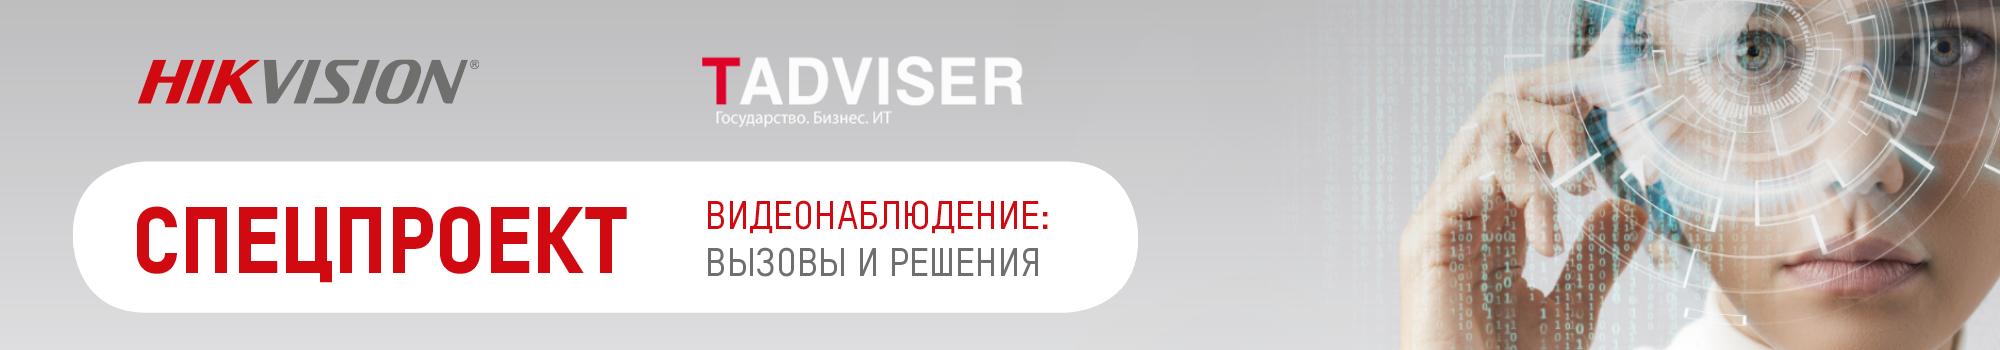 tadviser_2000x350